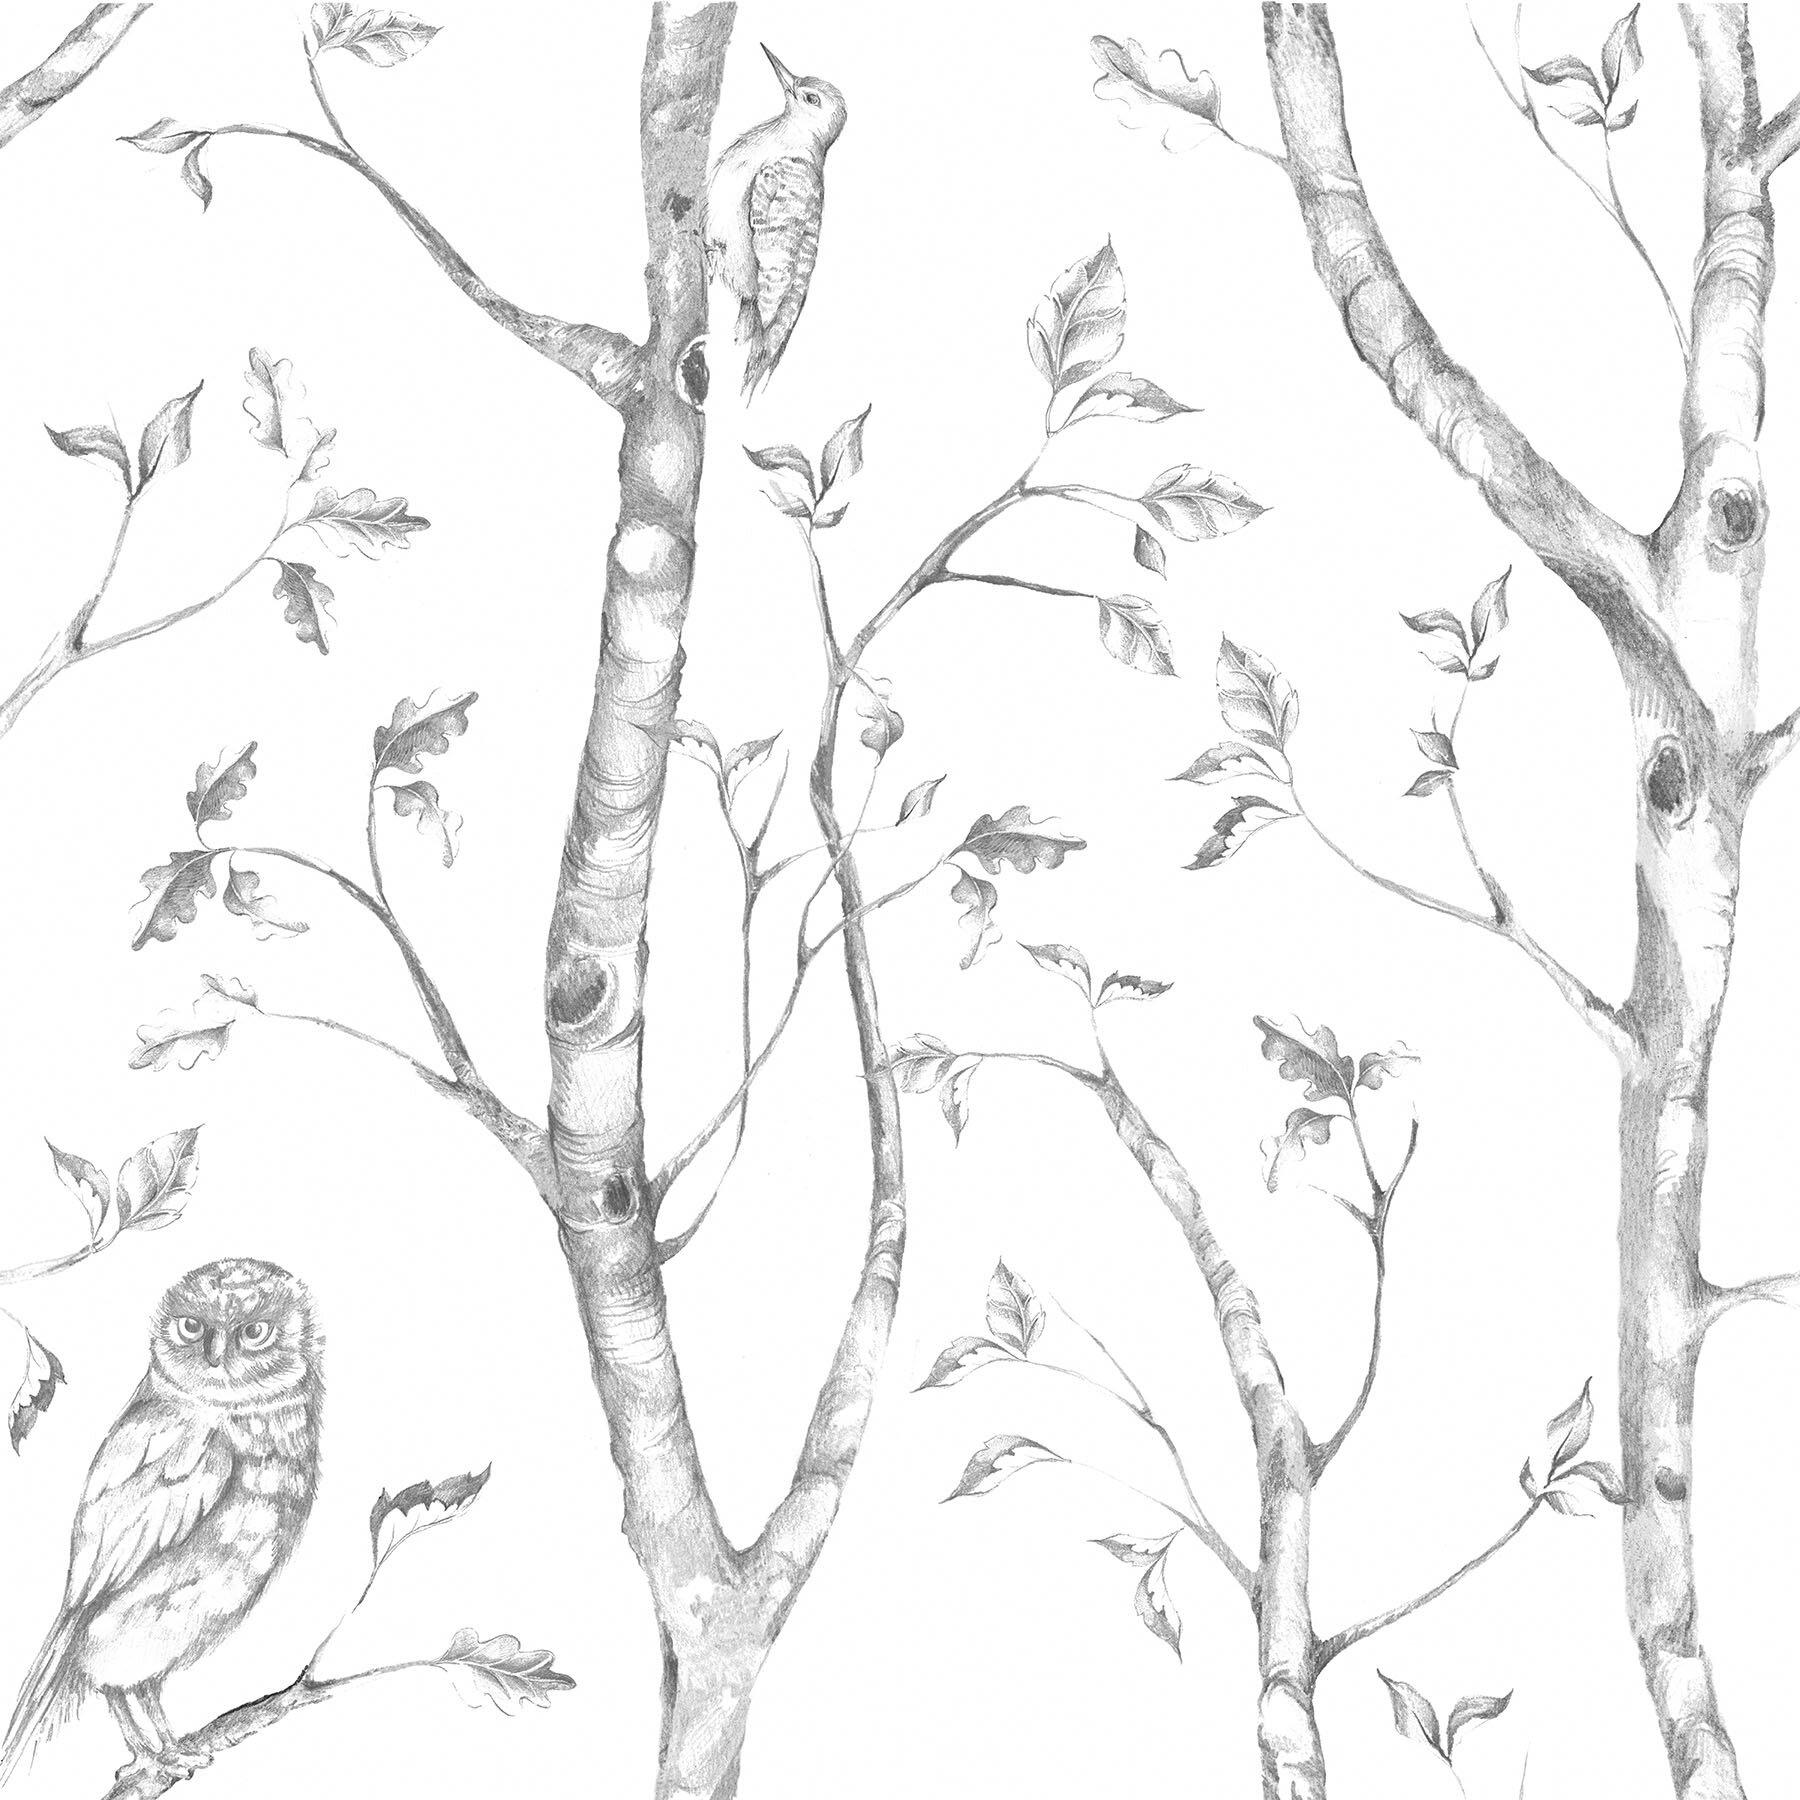 nomi woods